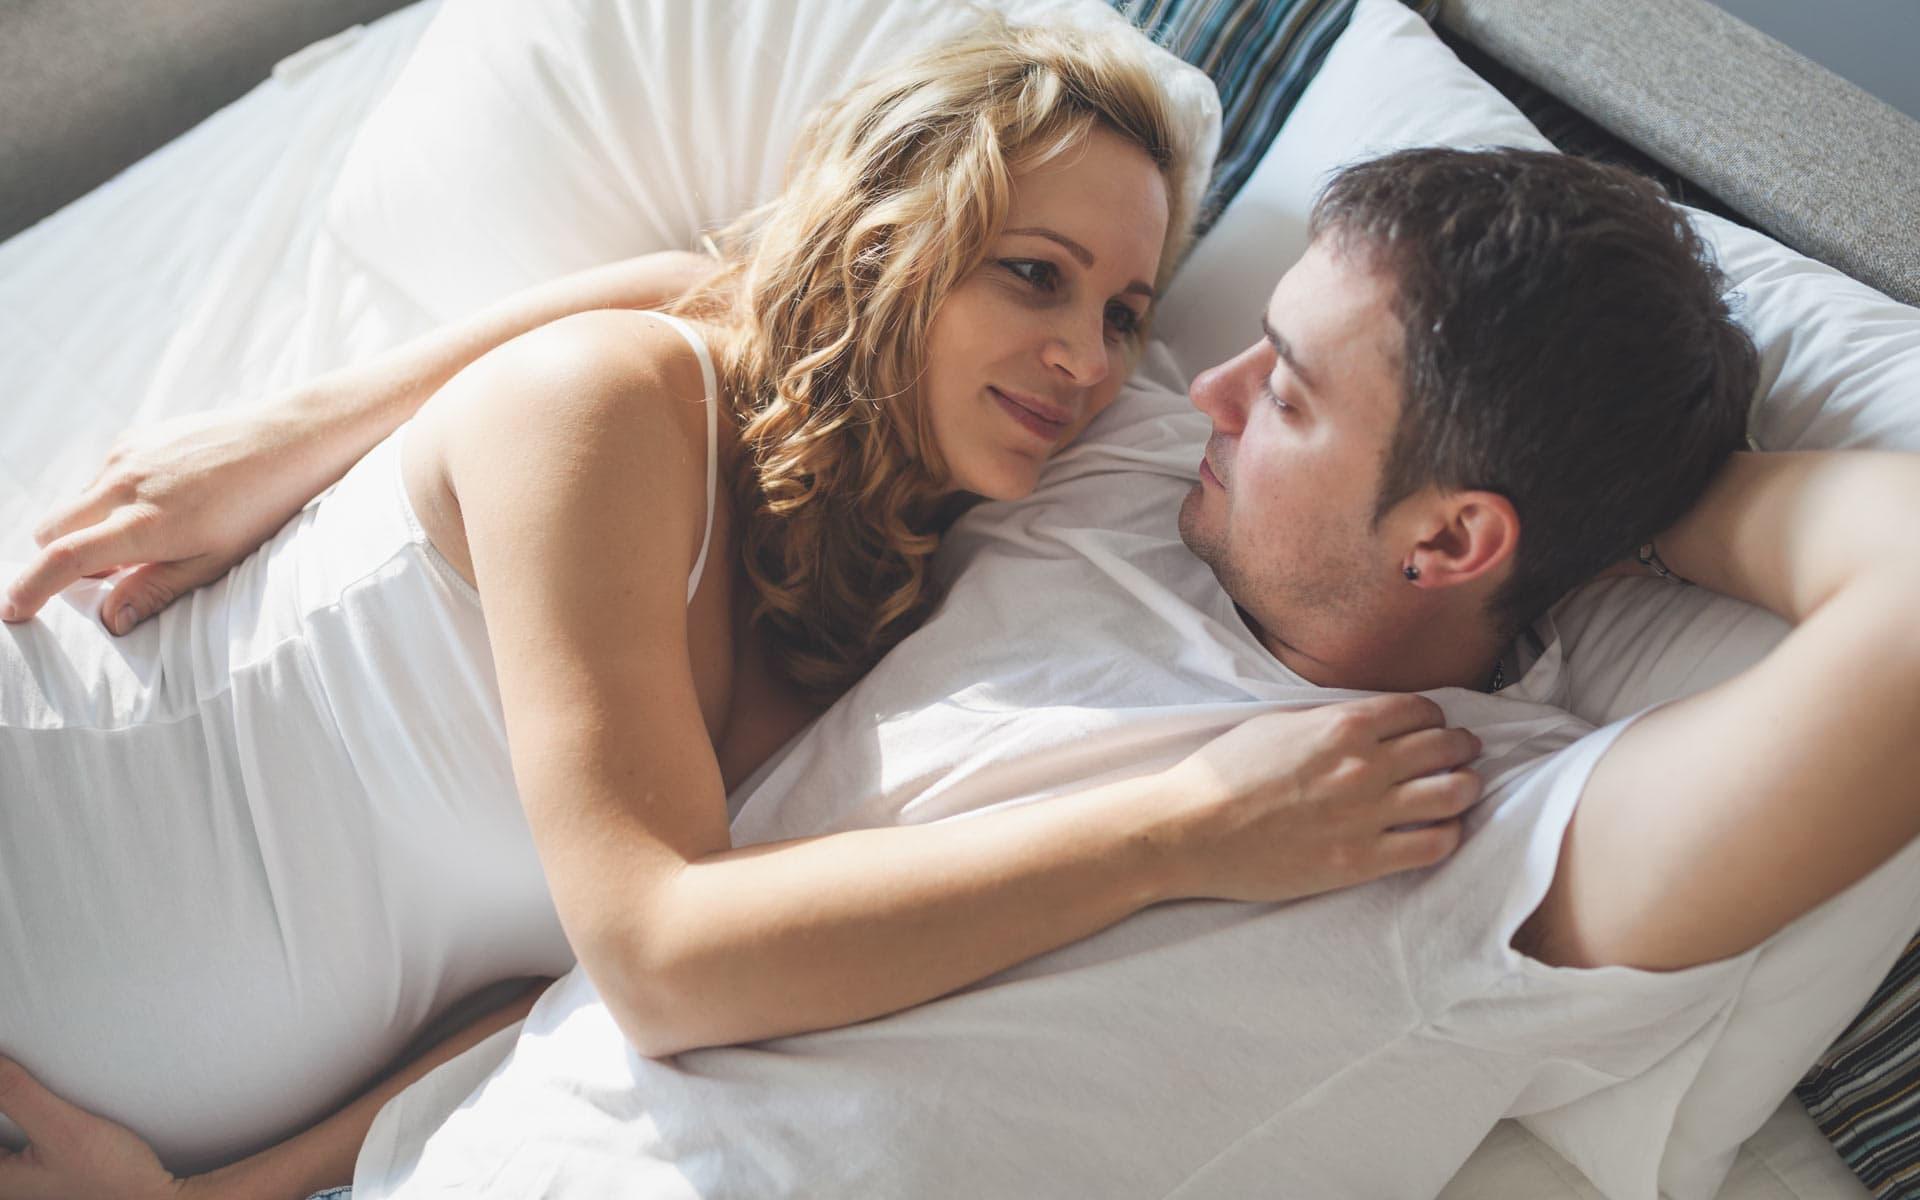 sex in der schwangerschaft bis wann